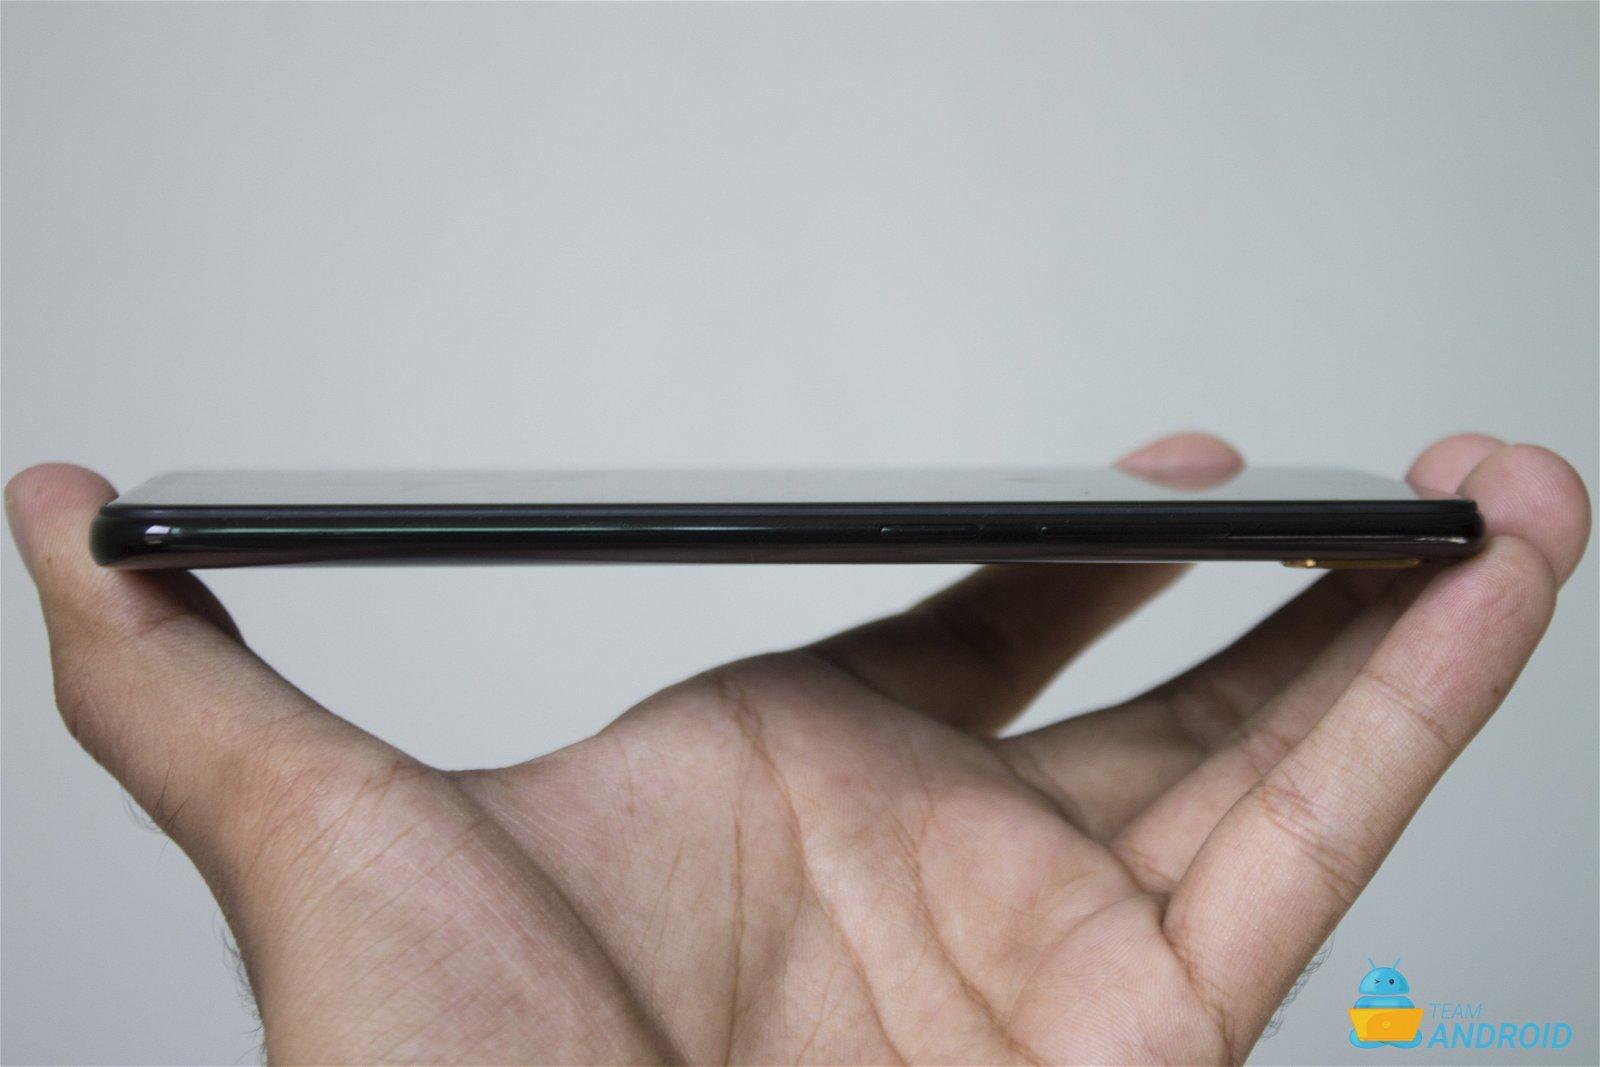 Vivo V11 Pro Review - Fastest Face Unlock, In-Display